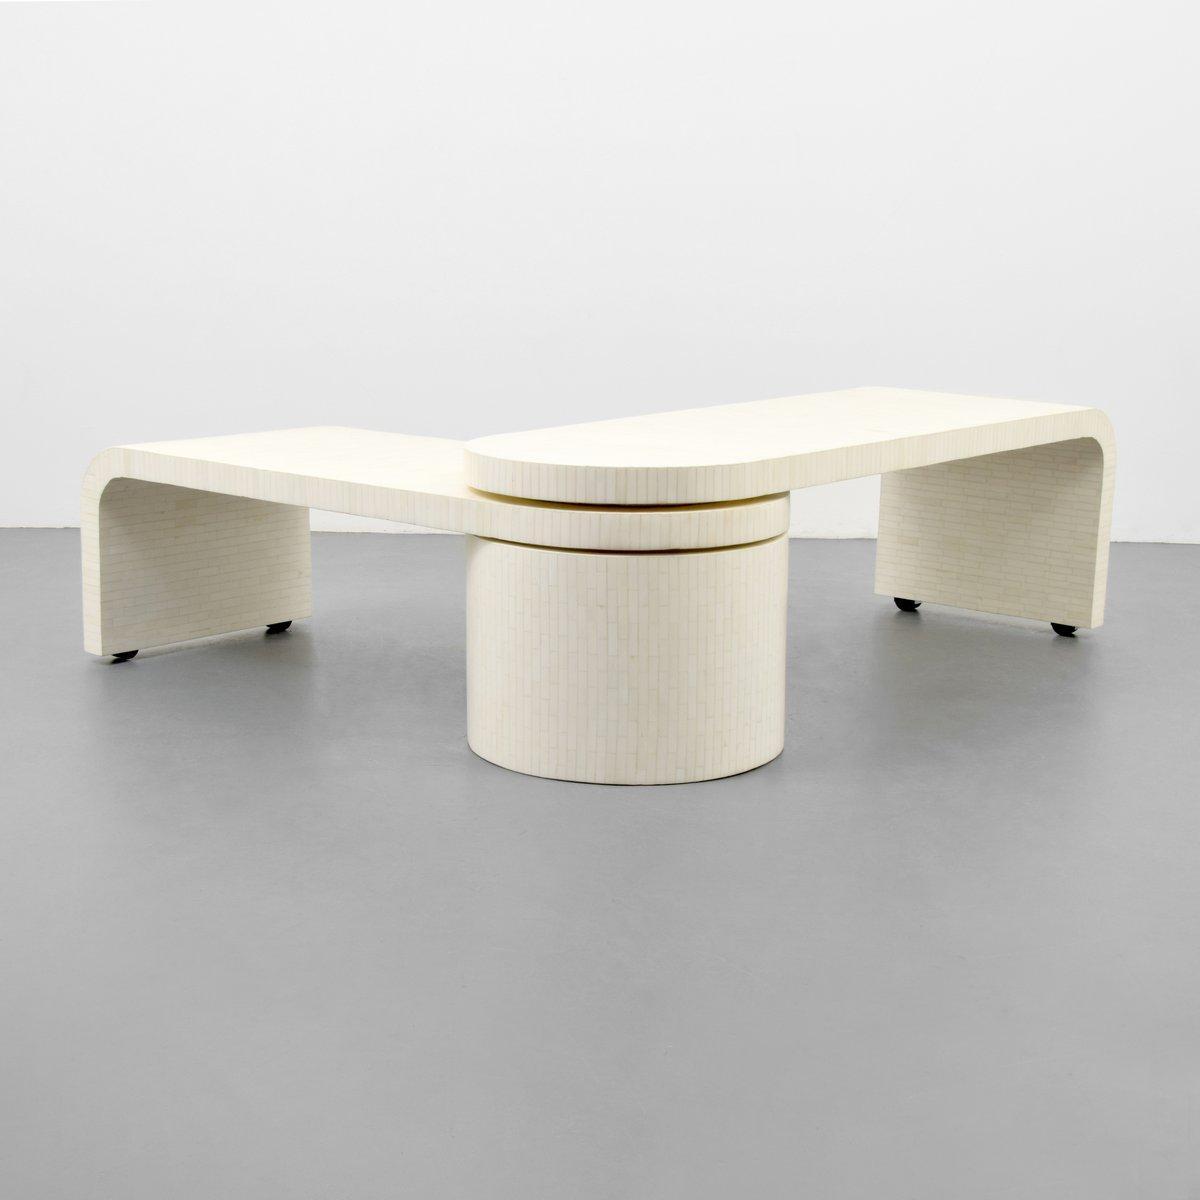 Tessellated Bone Coffee Table, Manner Of Karl Springer U2013 Lofty Marketplace